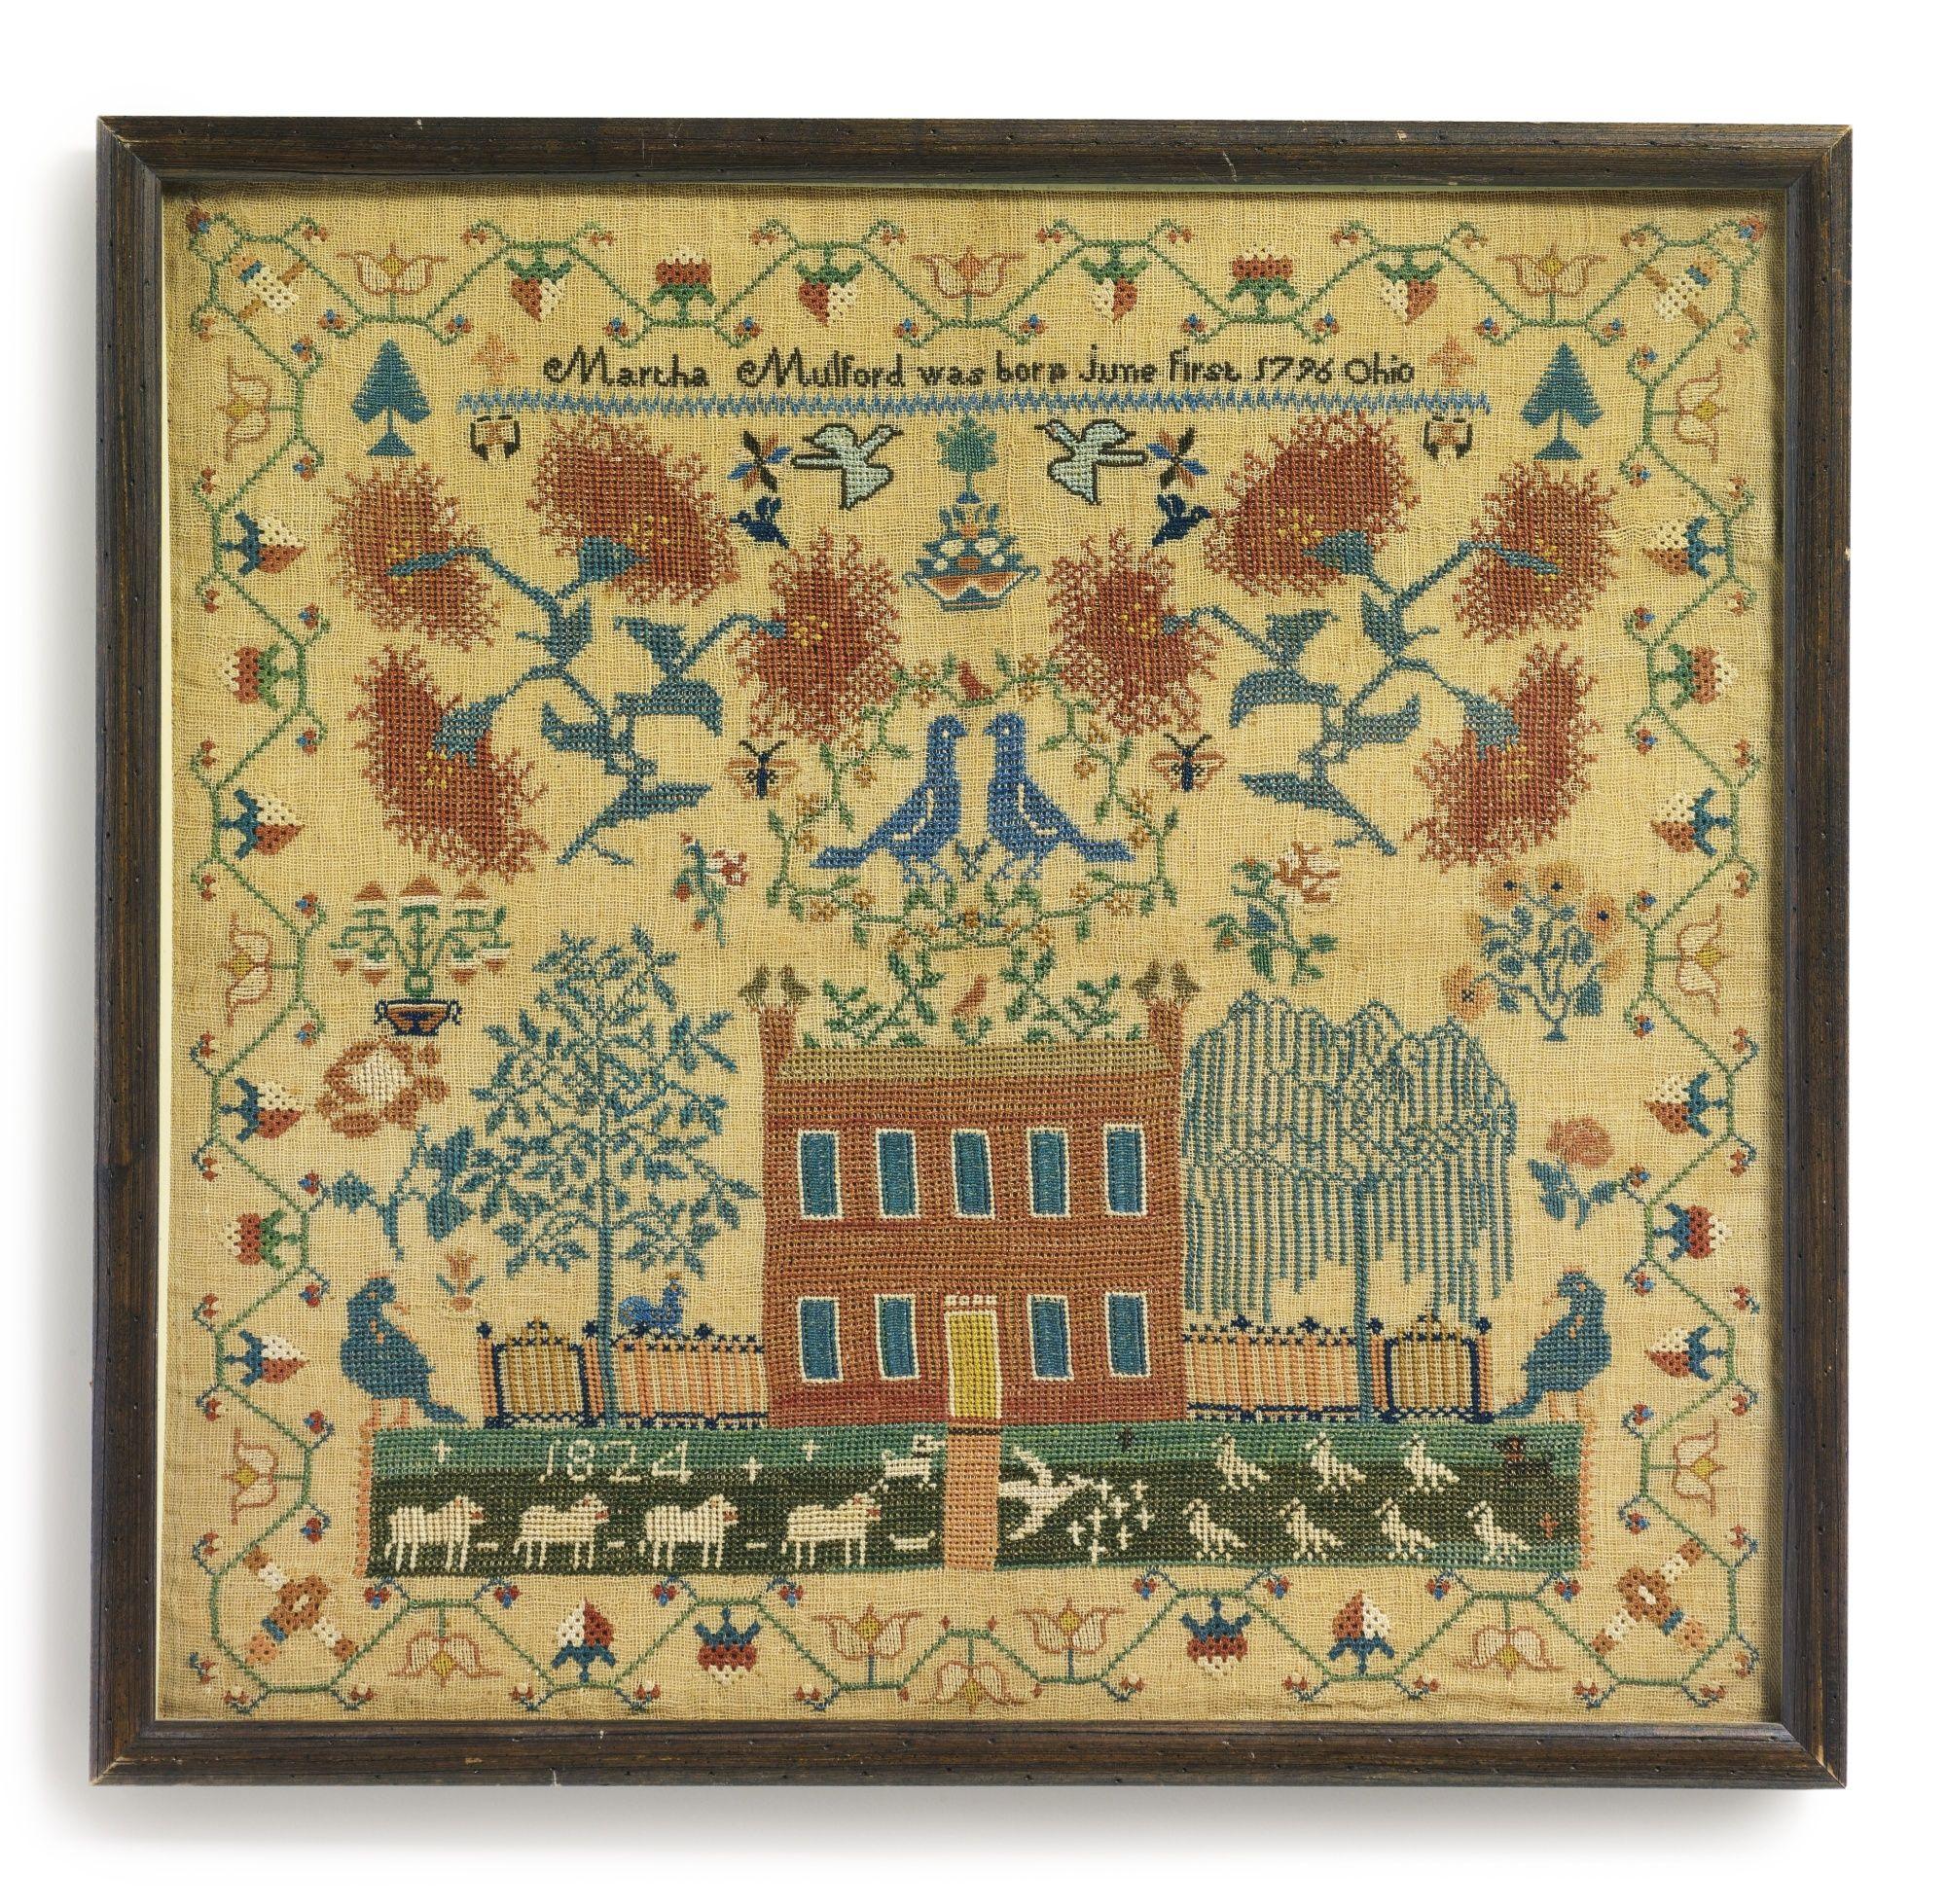 Ohio clark county new carlisle - Rare Needlework Sampler Martha Mulford New Carlisle Clark County Ohio Dated 1824